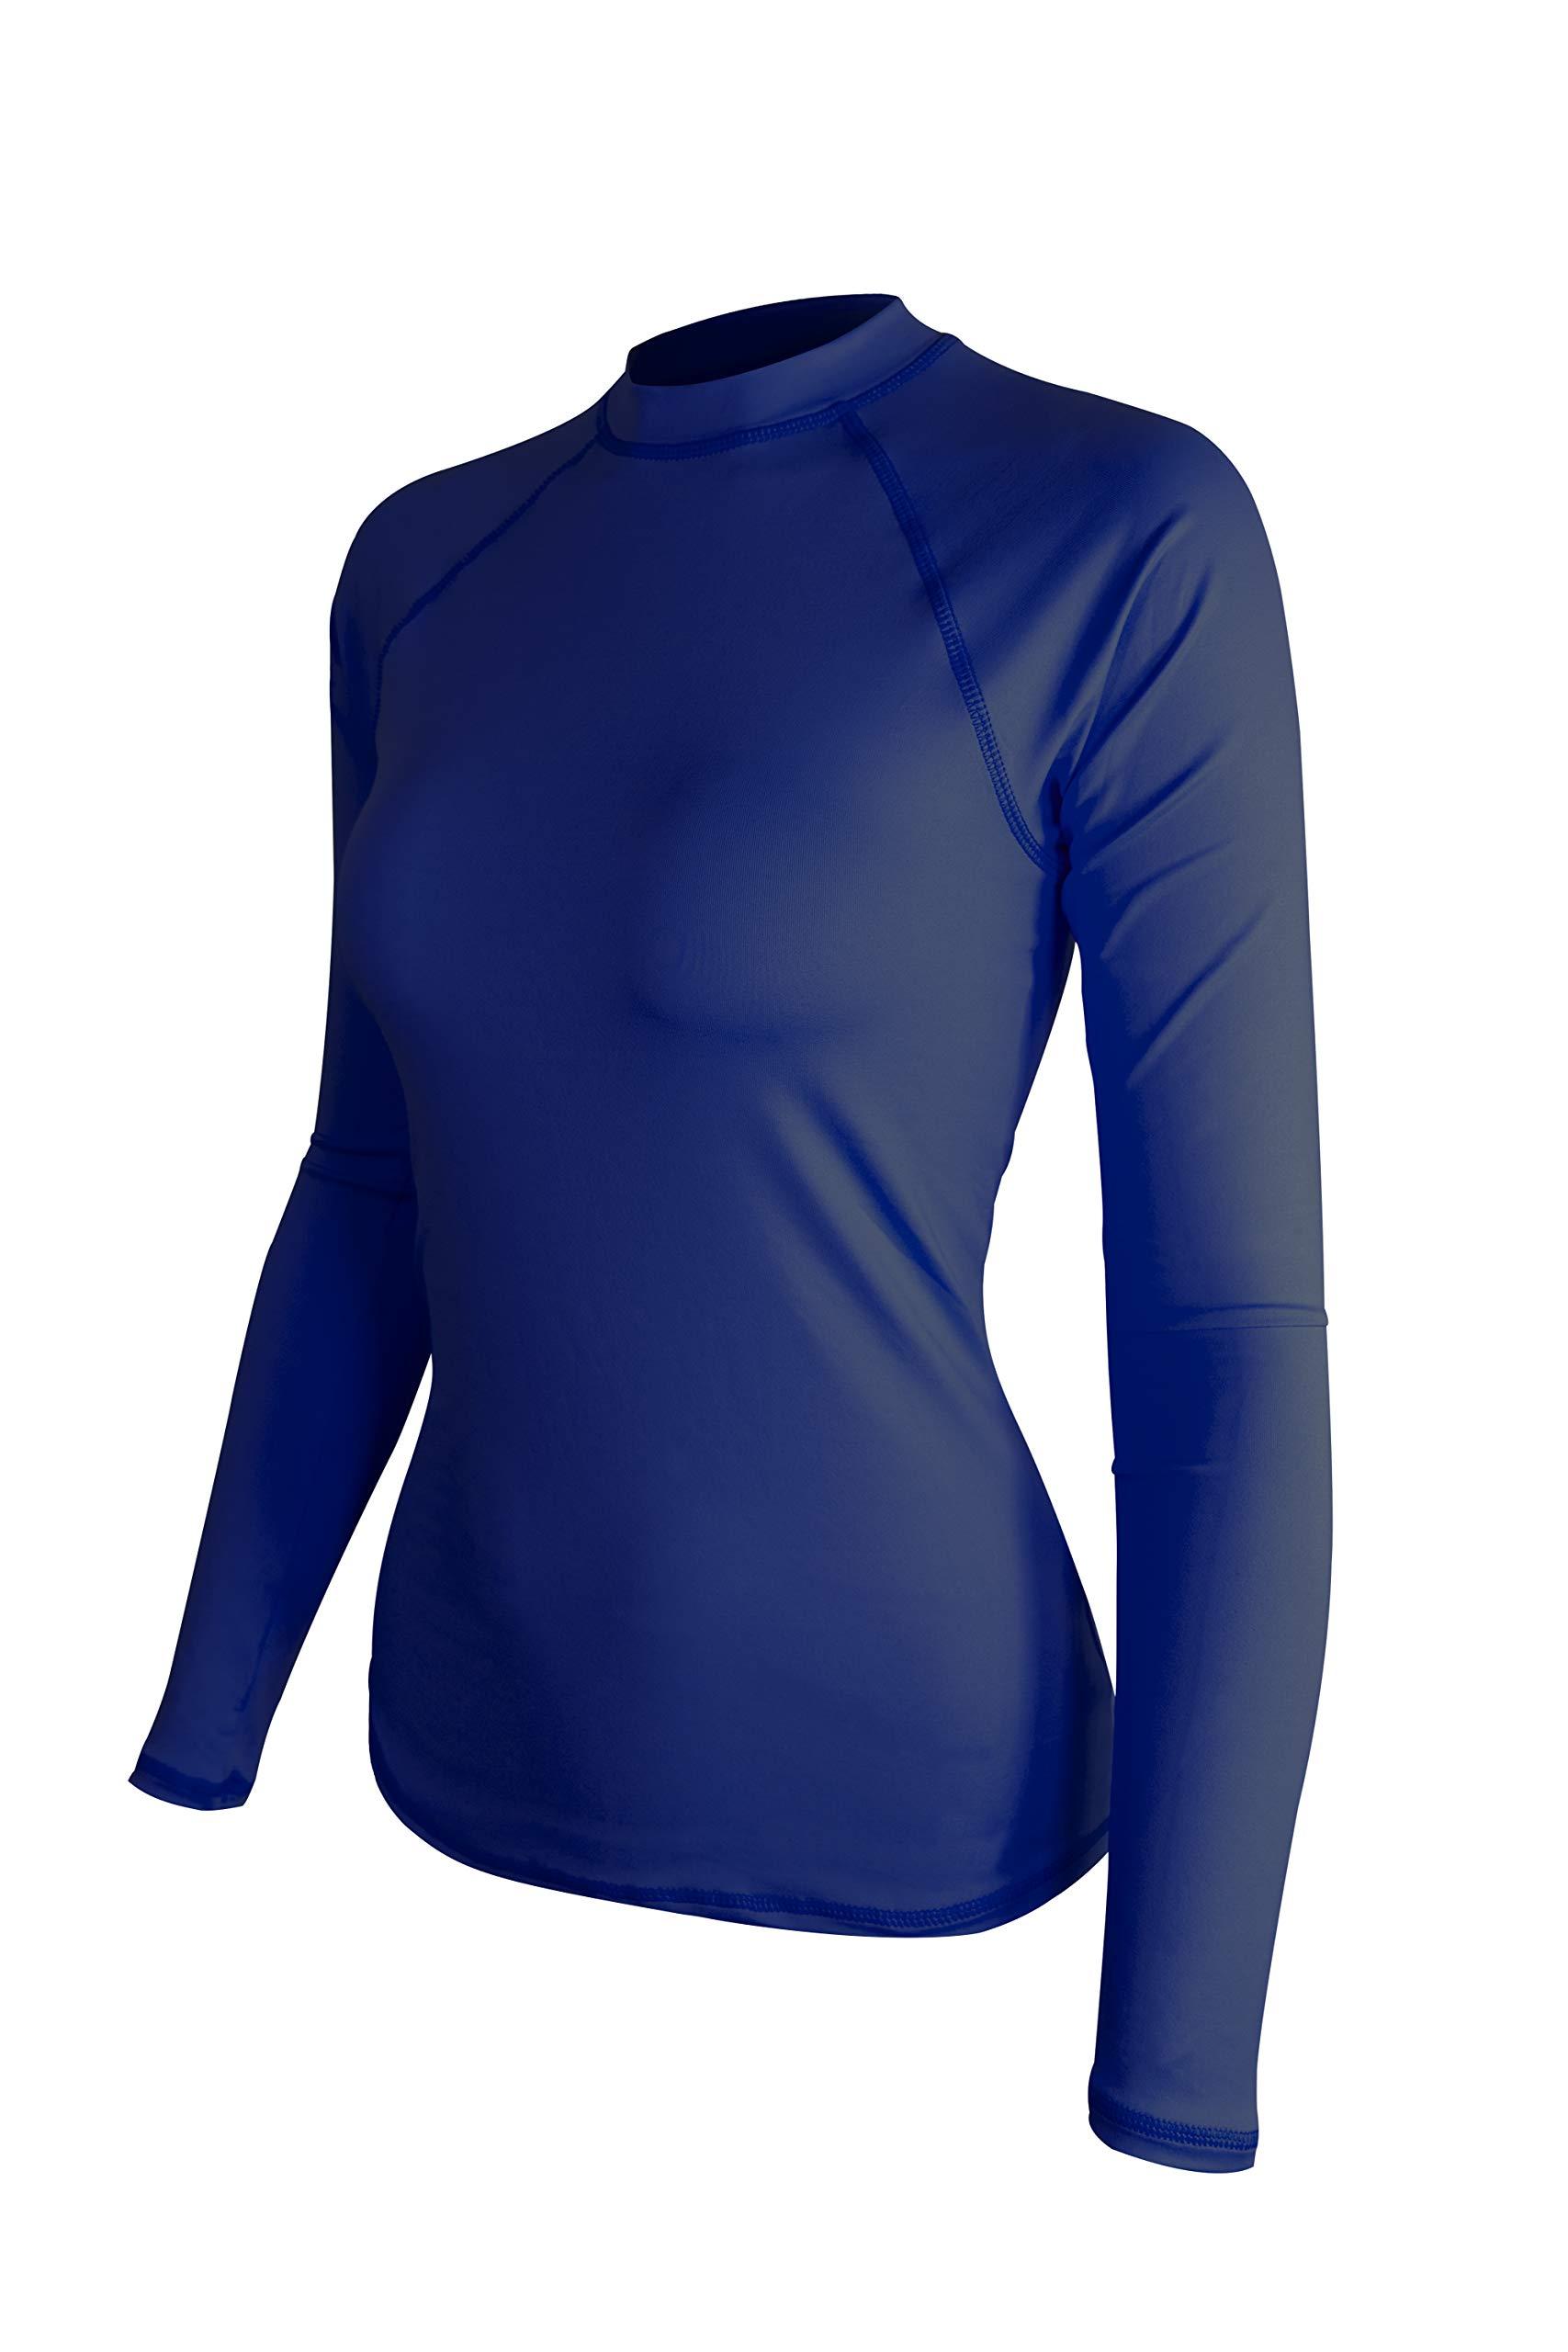 ALLEZ Women's Long Sleeve Rash Guard Athletic Tops Swimwear UPF 50+ Sun Protection Swim Shirts (Navy, Large) by ALLEZ